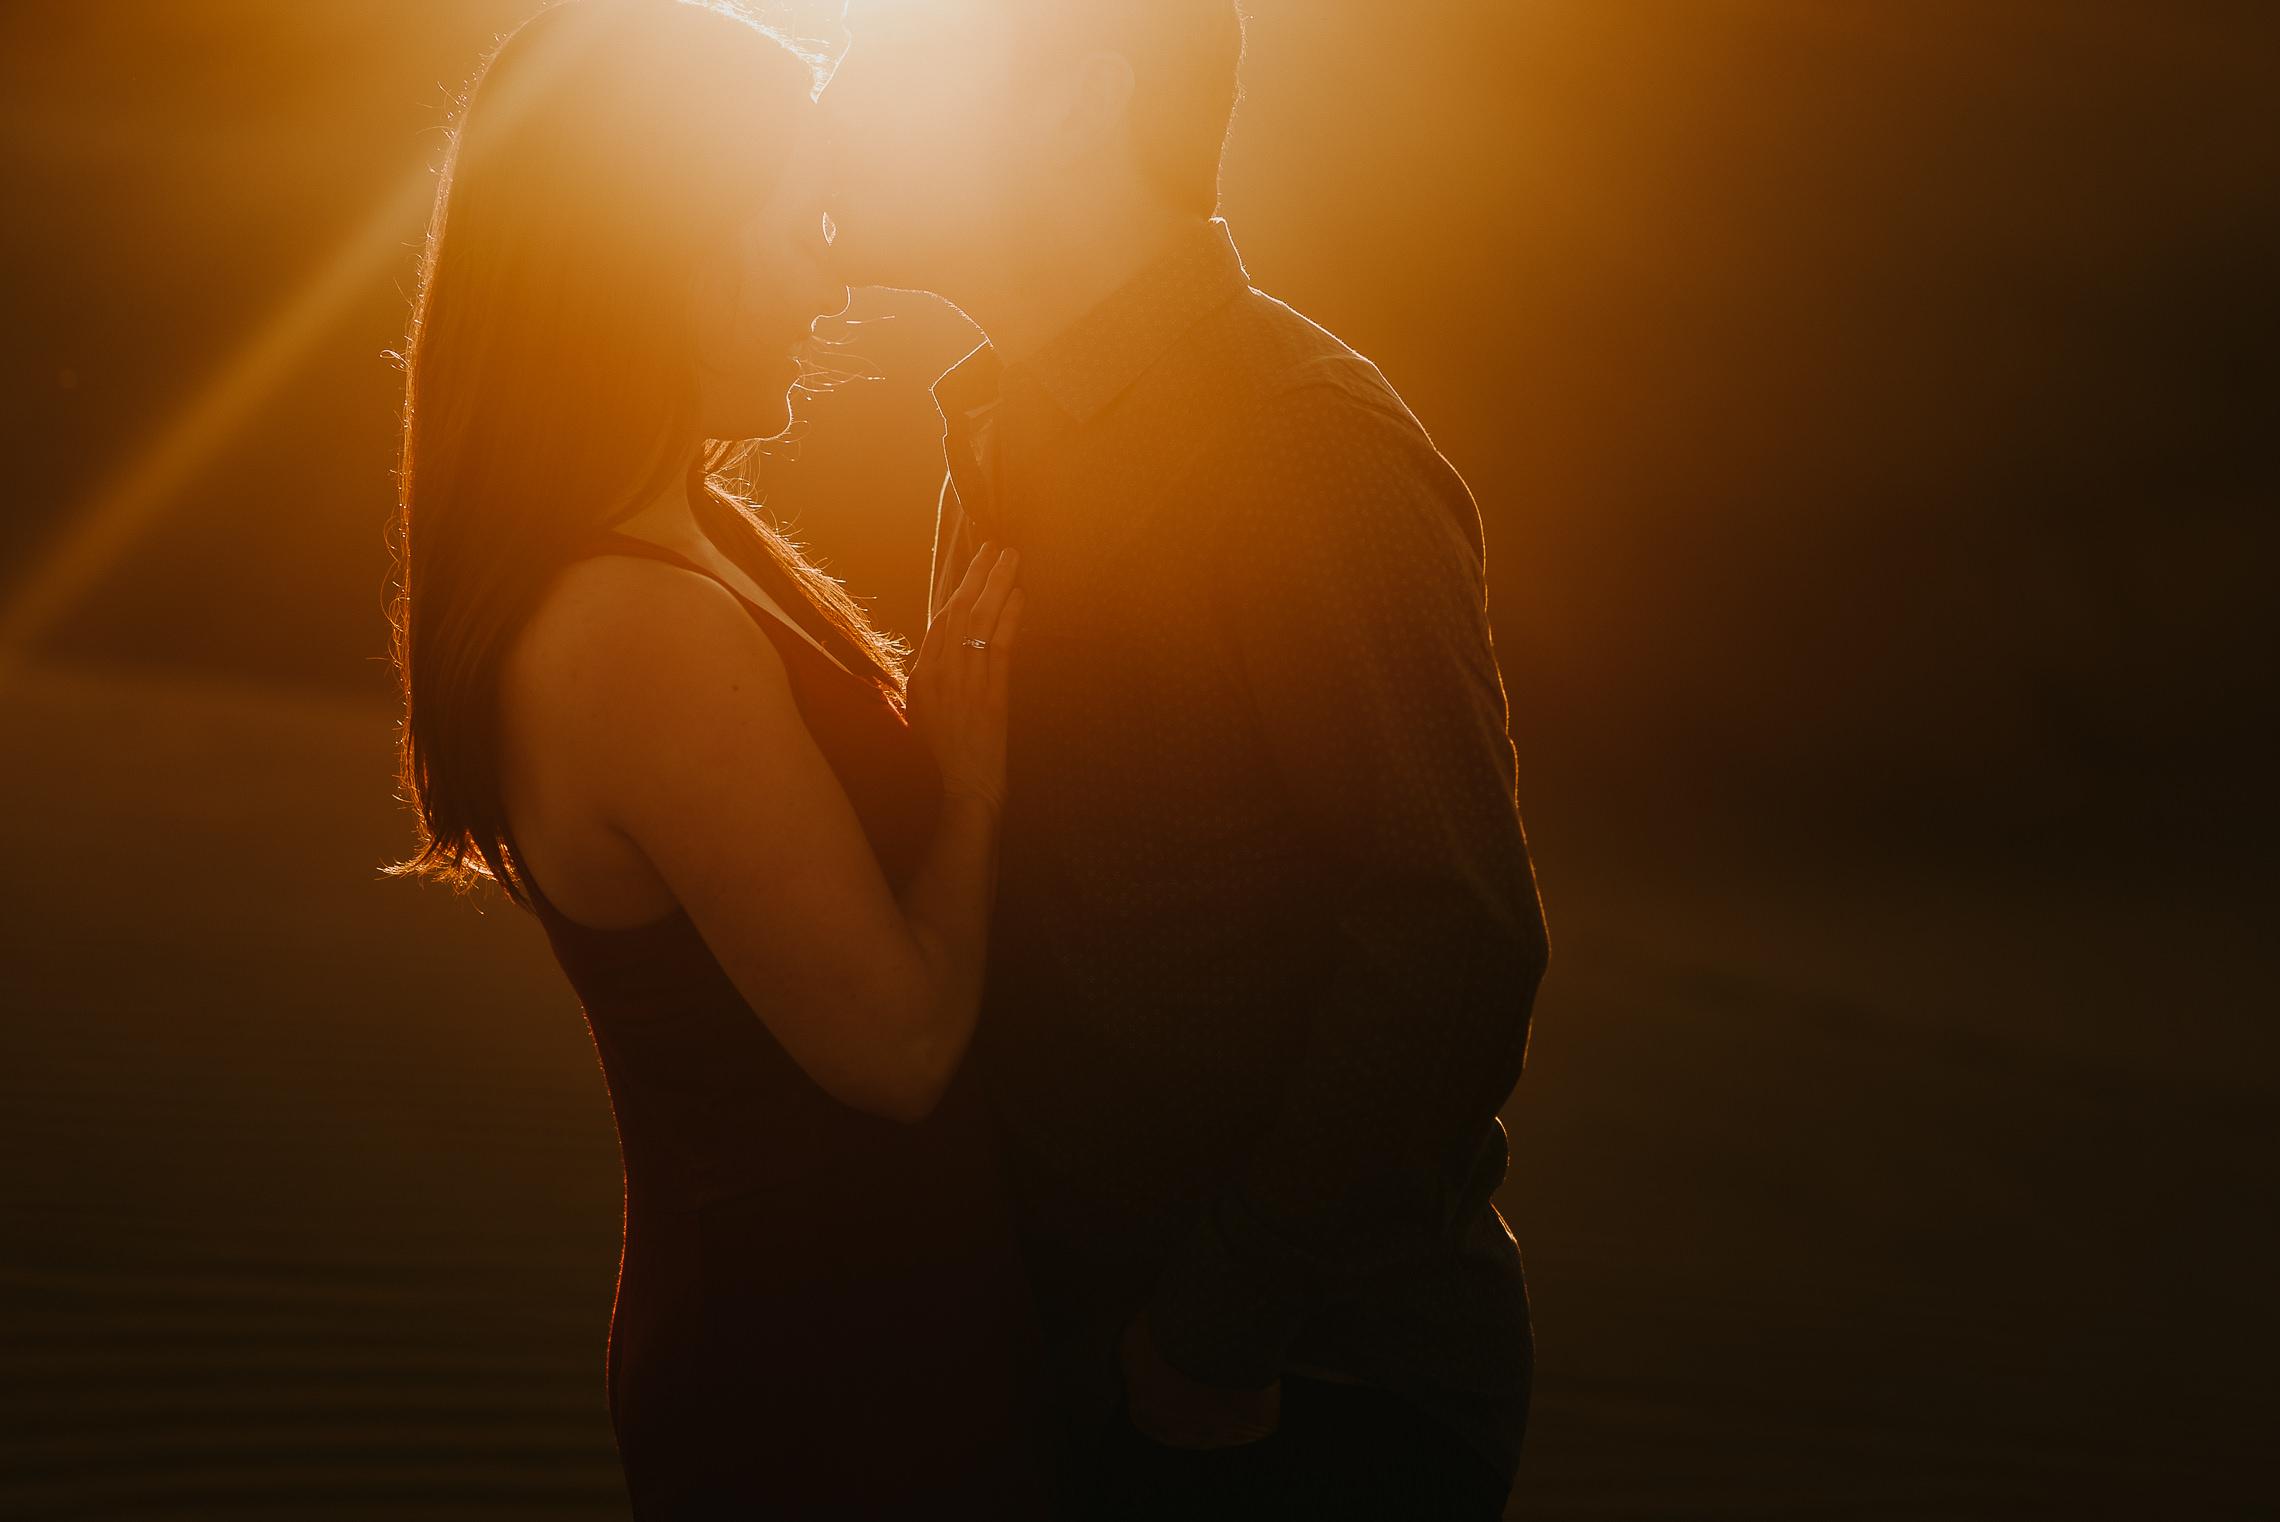 preboda-engagement-destination-wedding-concon-dunas-chile-quinta-region-matrimonio-fotografo-deborah-dantzoff 02